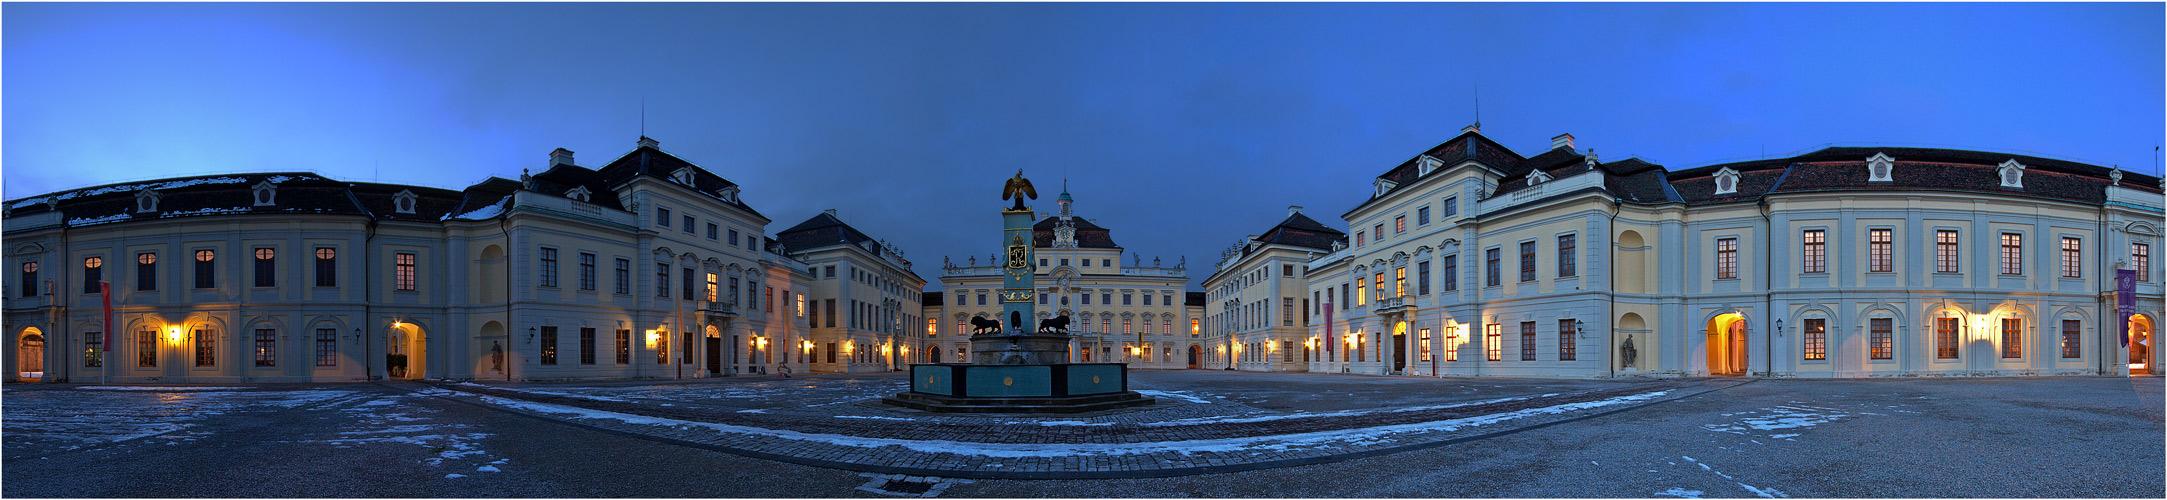 Schloss Ludwigsburg IV